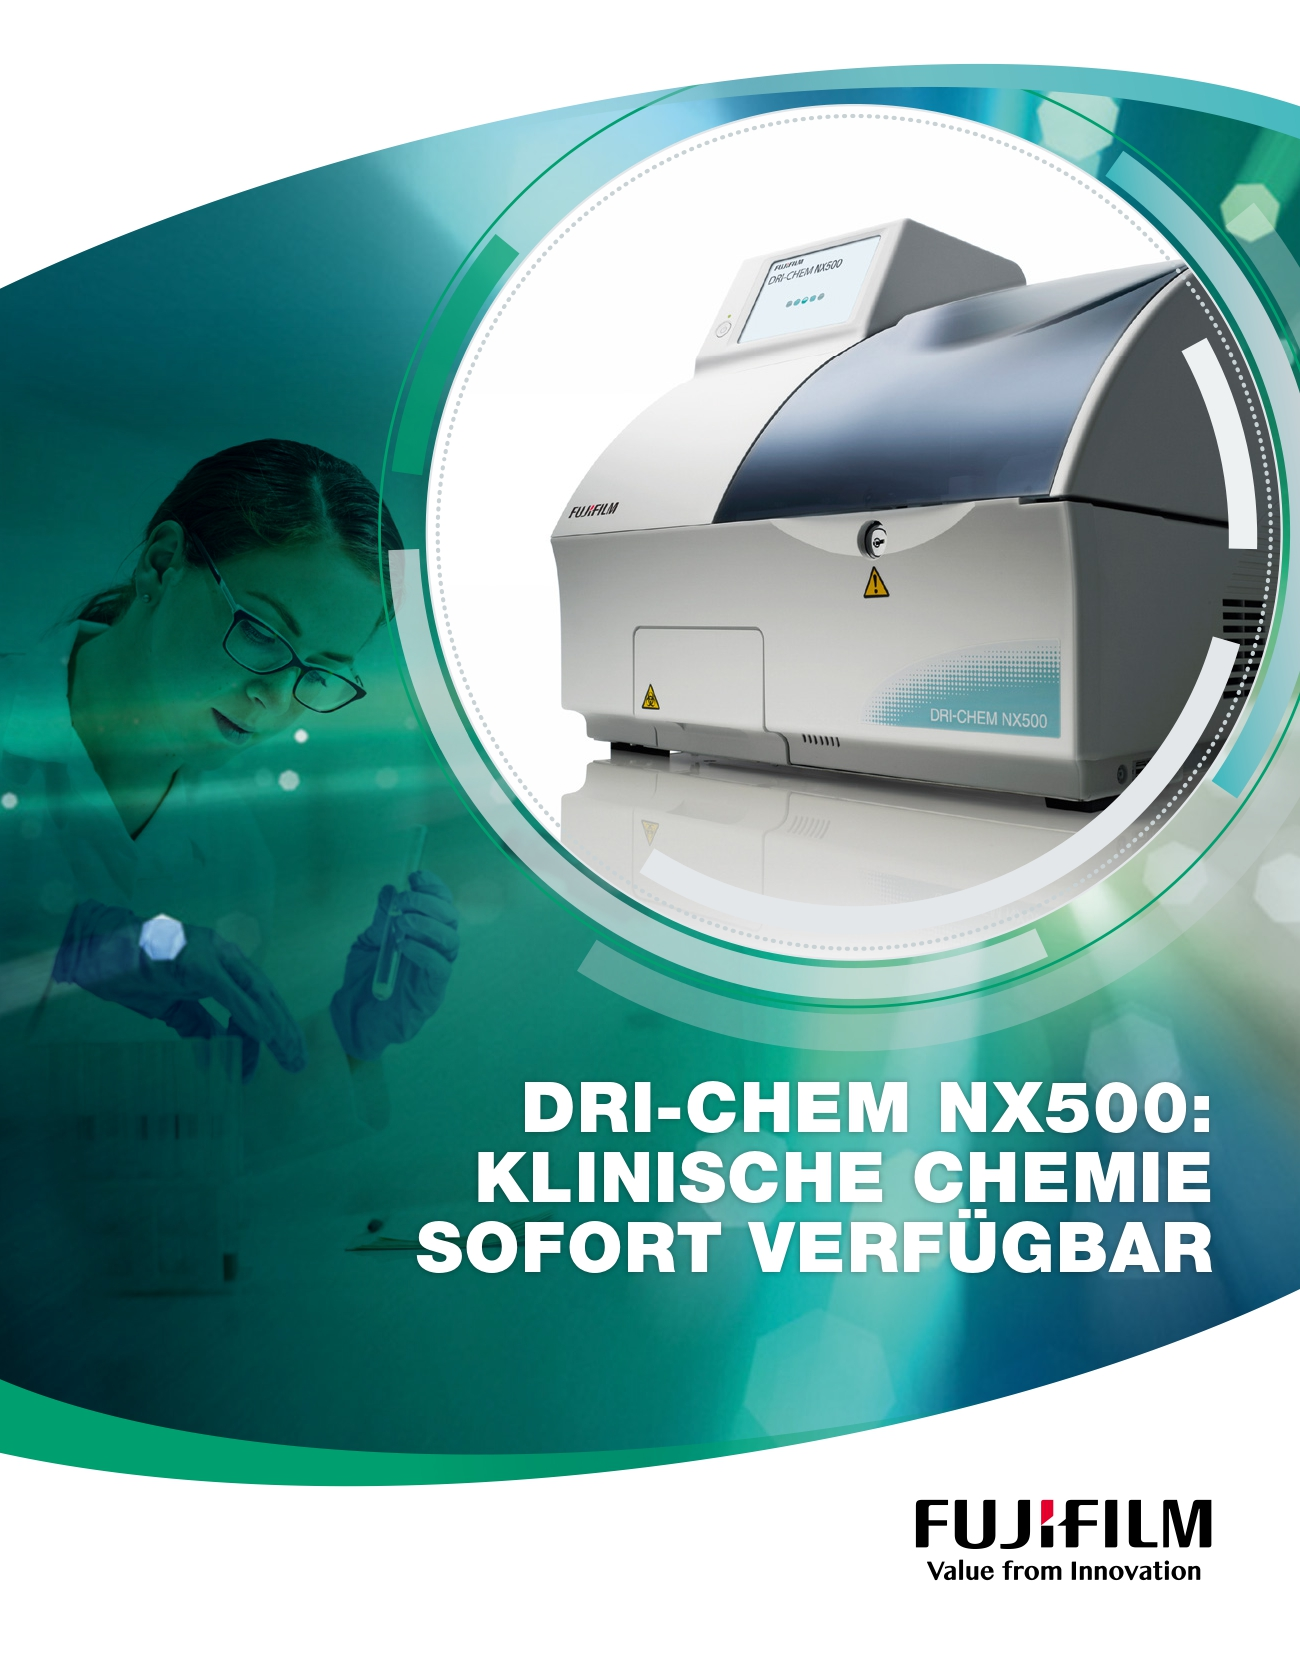 [Foto] FUJIFILM DRI-CHEM NX500 Cover brochure